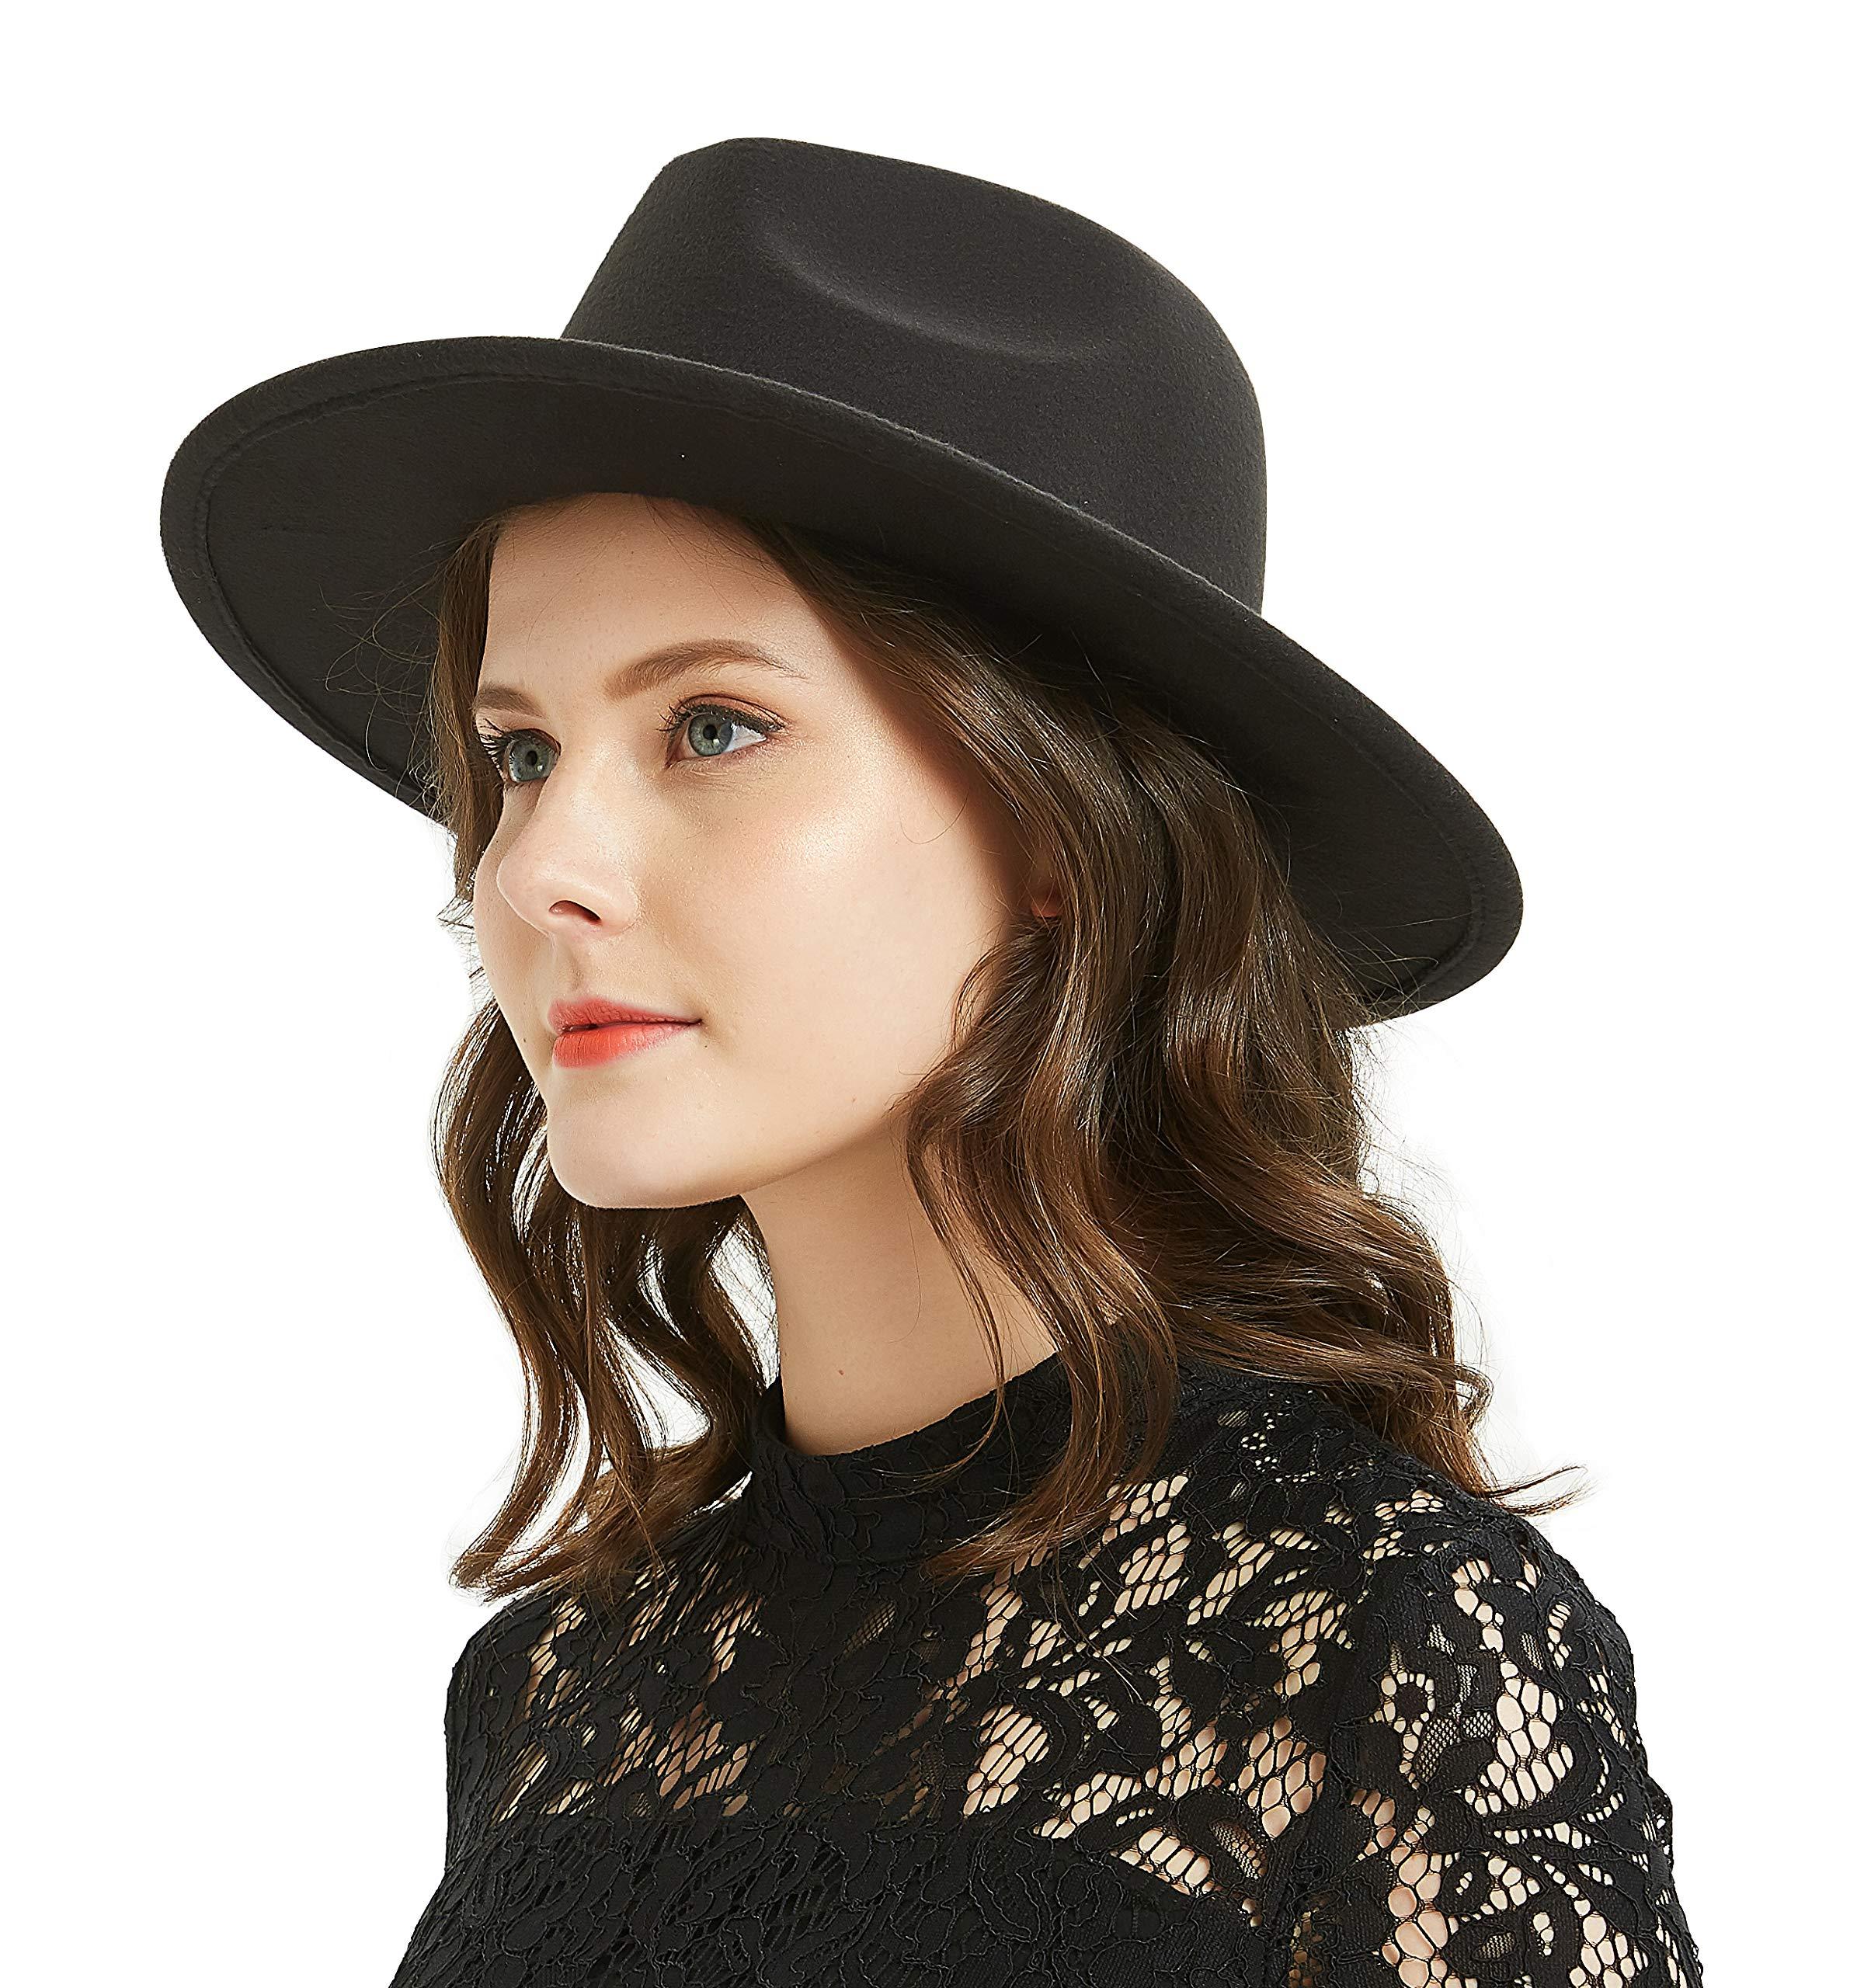 Women or Men Woolen Felt Fedora Vintage Short Brim Crushable Jazz Hat, Black 58-60cm